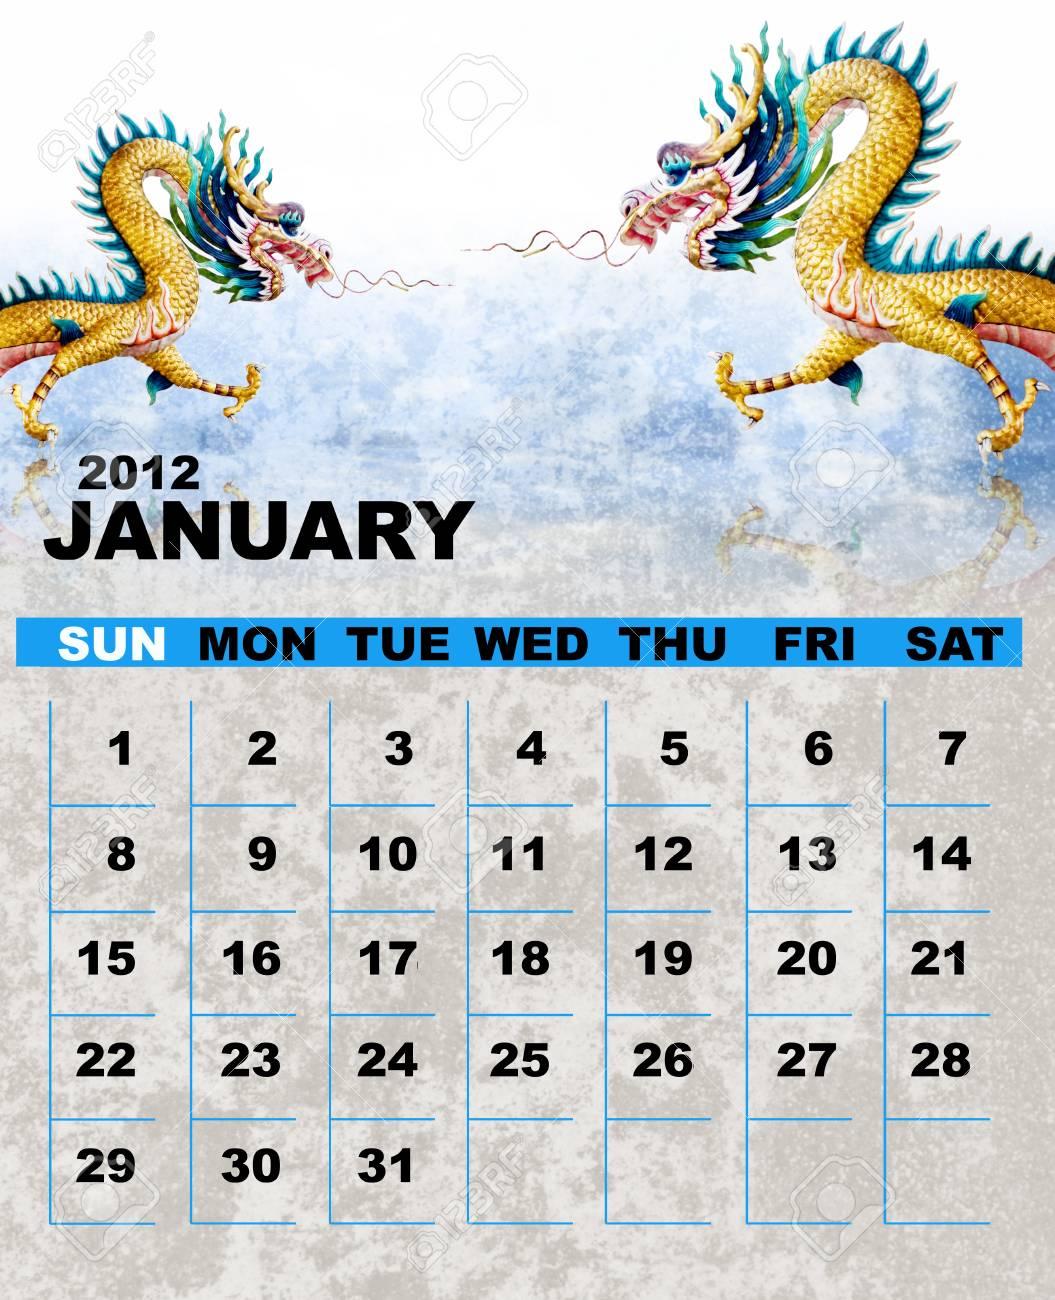 Calender 2012 January, Dragon's year Stock Photo - 11601560